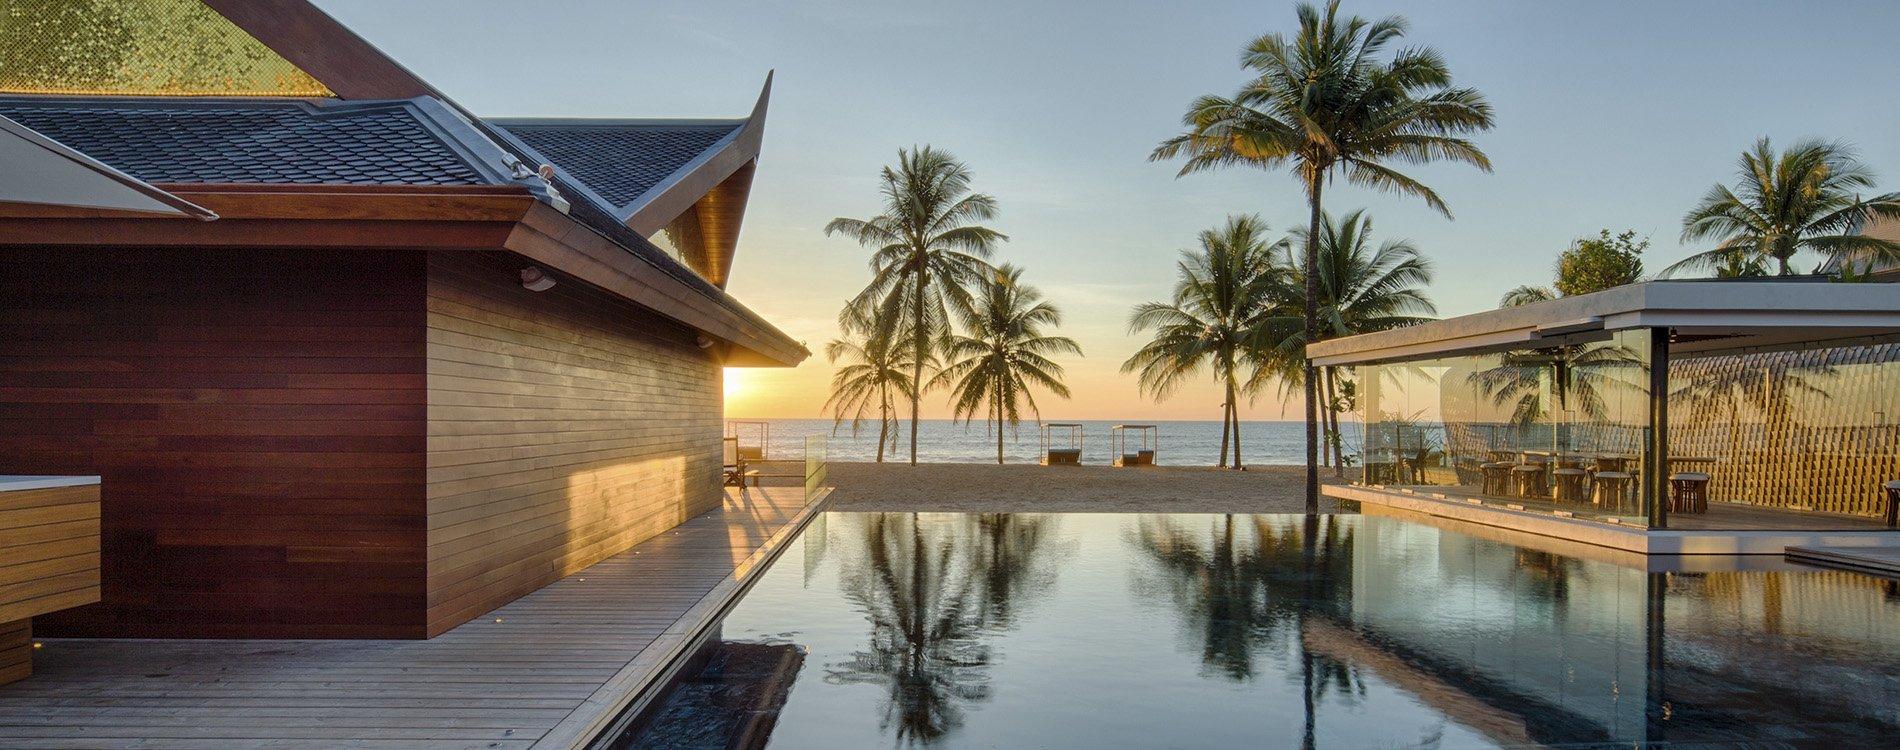 Iniala Beach House, diseño español en Tailandia